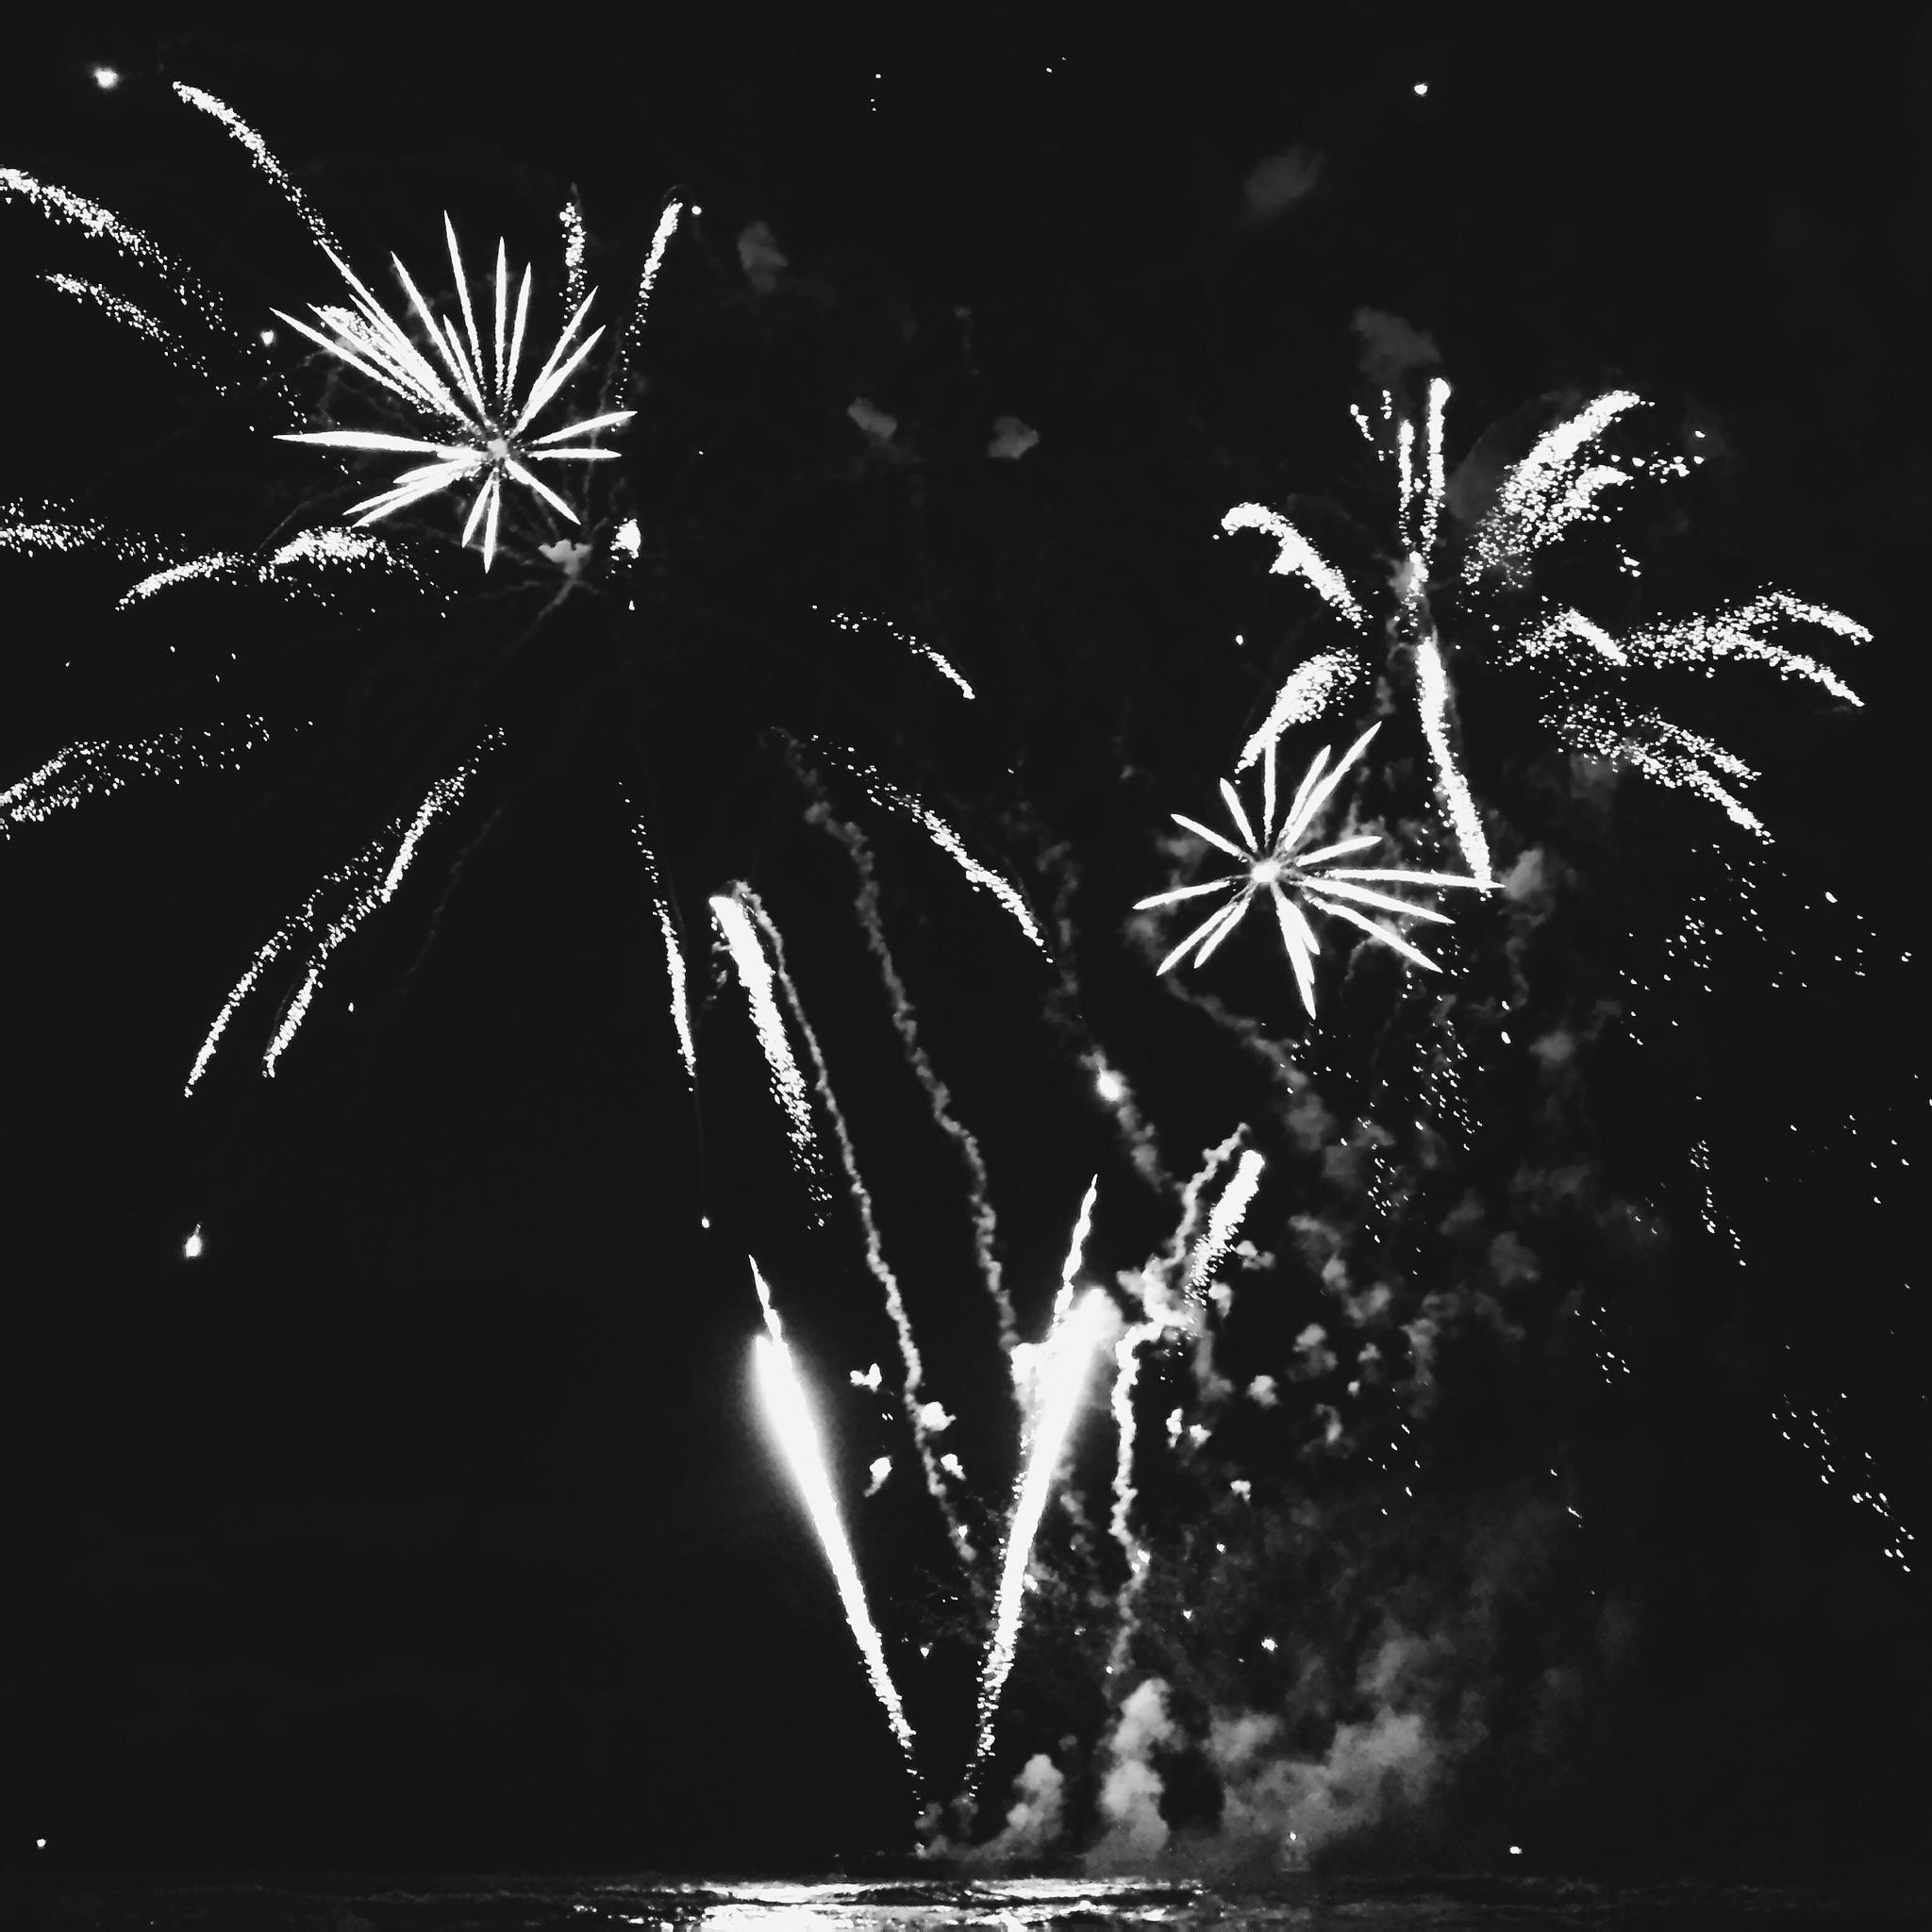 fonografie: Vuurwerkfestival Scheveningen 2014